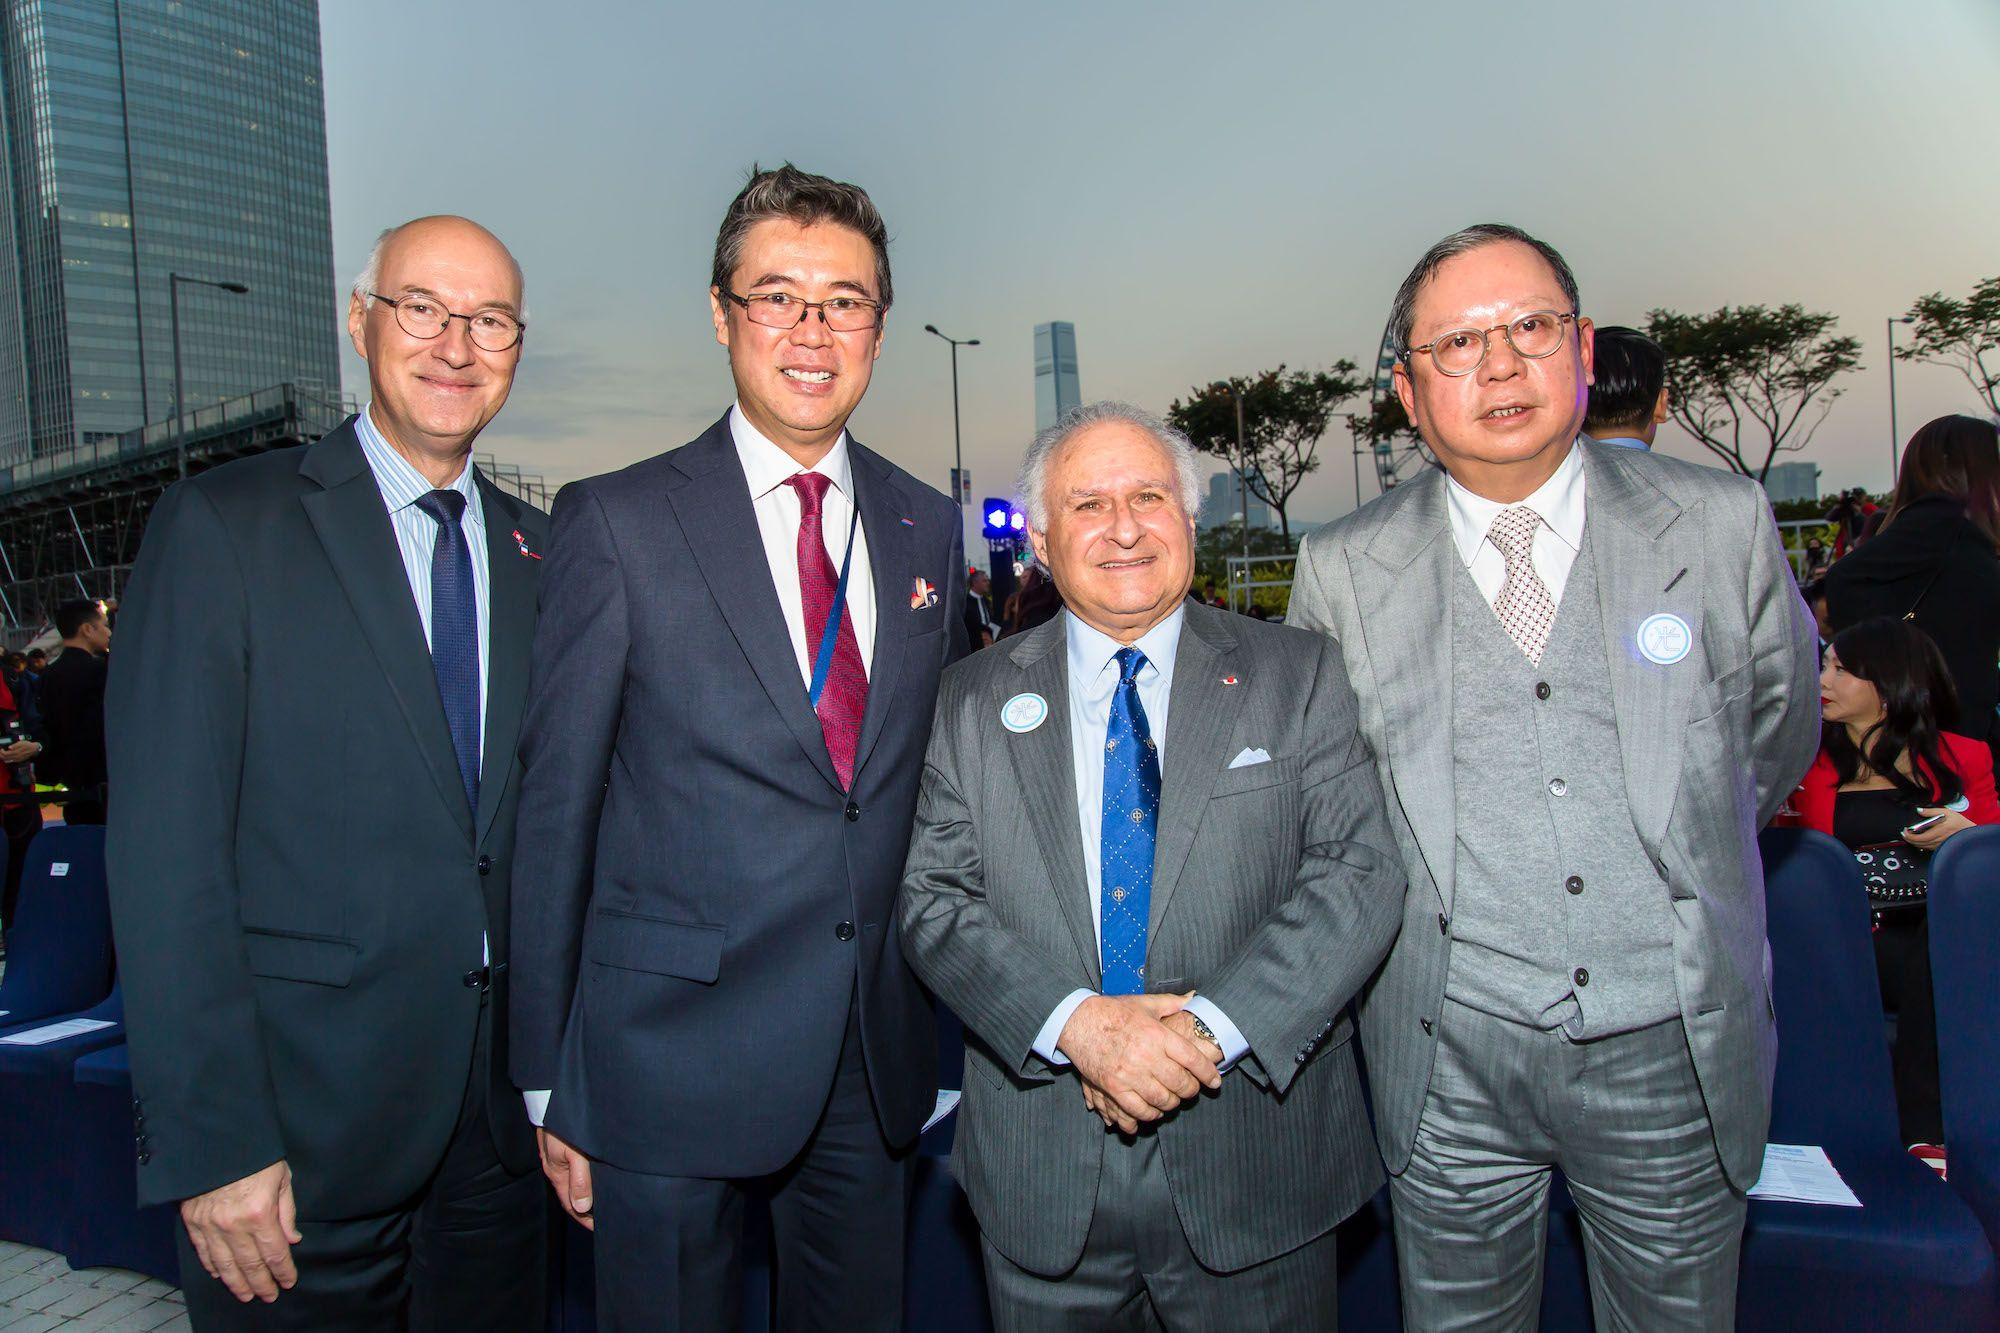 Eric Berti, Andrew Yuen, Michael Kadoorie, Peter Lam